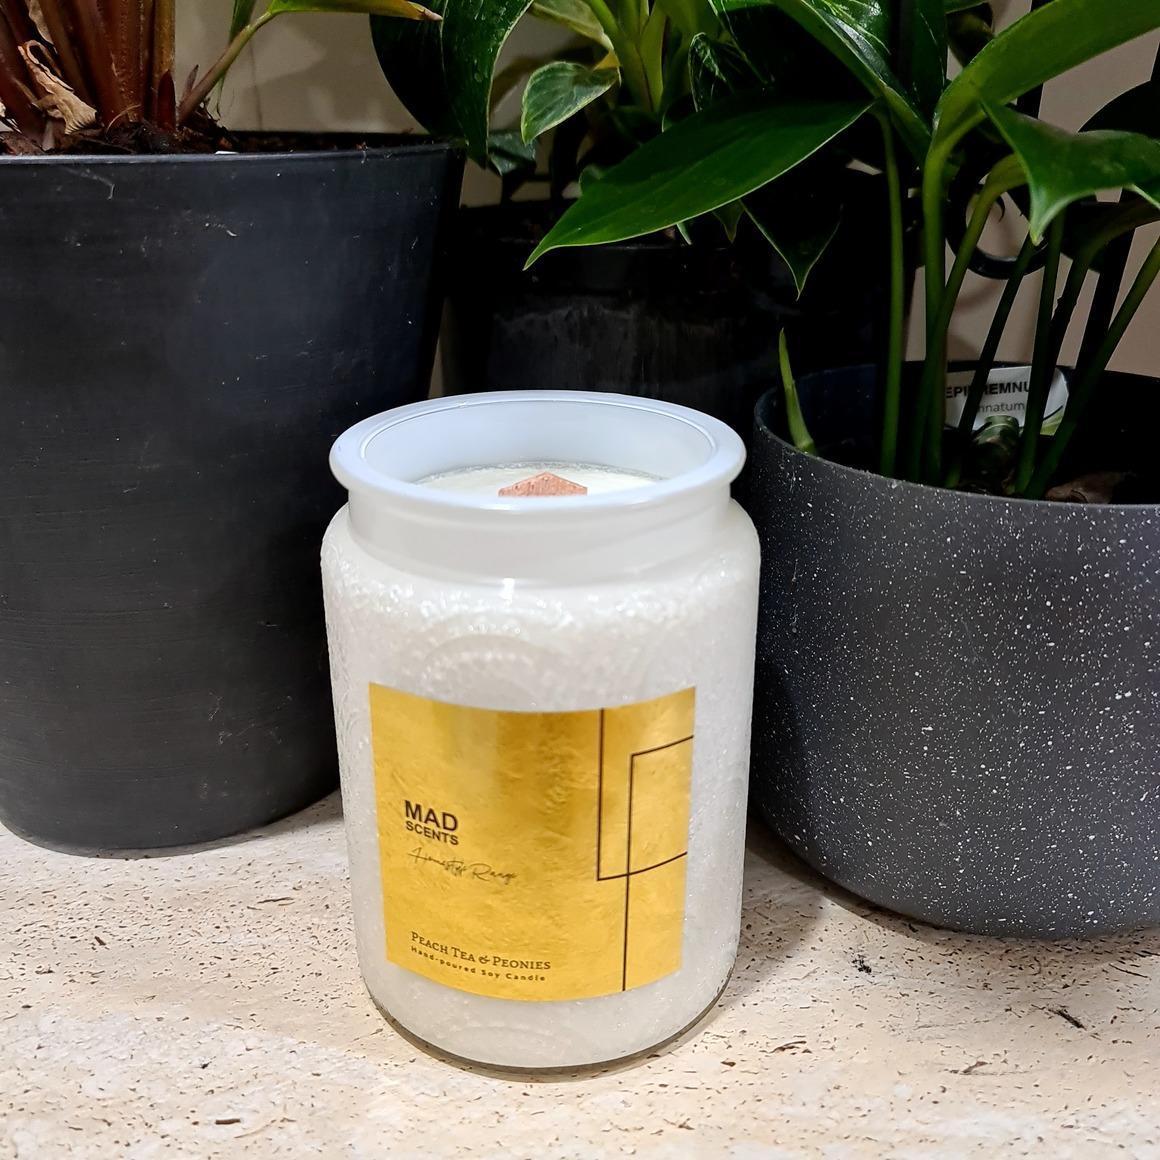 Peach Tea & Peonies Wood Wick Candle | Trada Marketplace